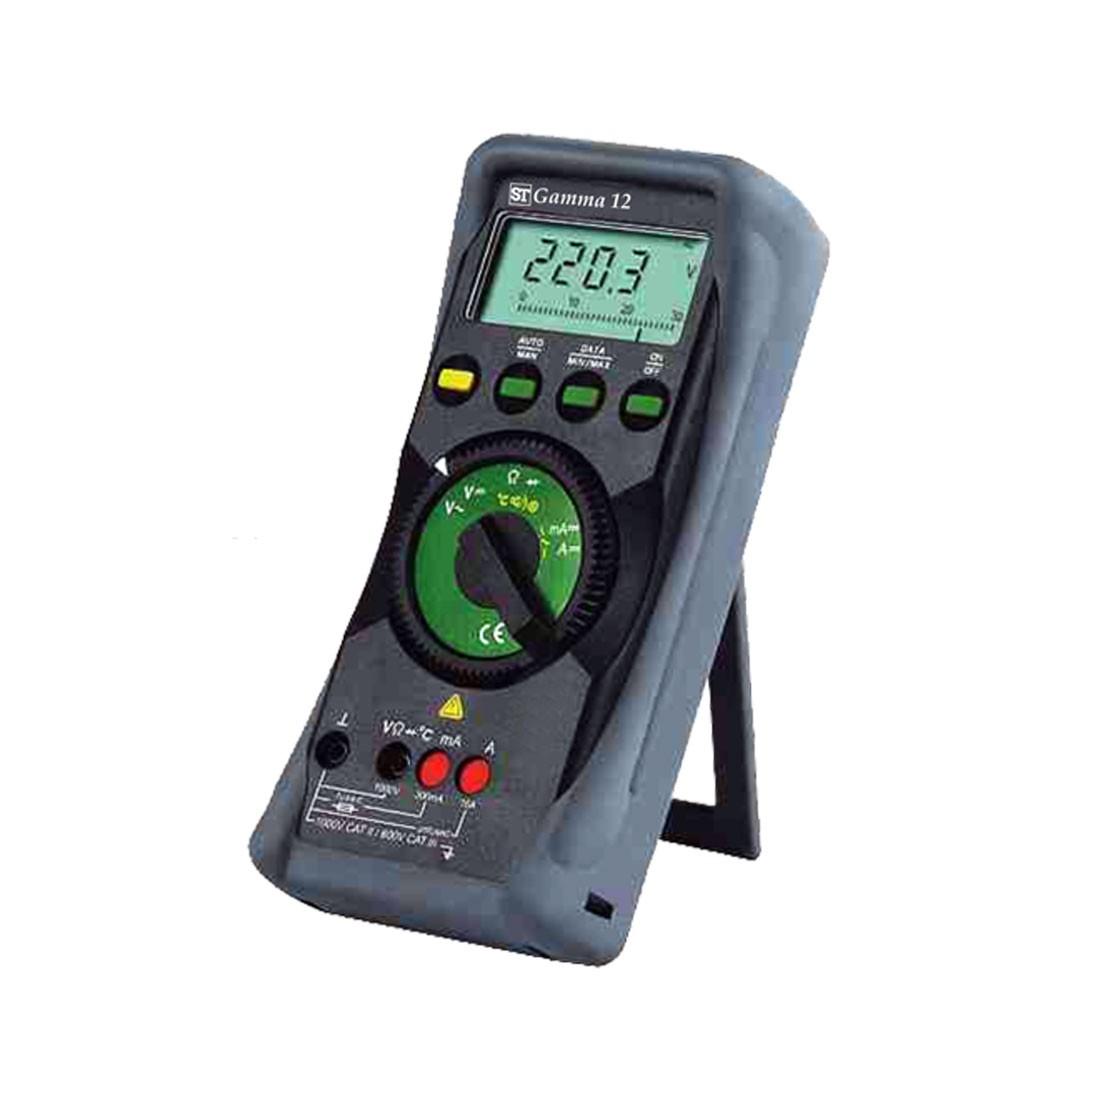 Gamma 12 Multimeter with Terminal Blocking for Maximum Safety